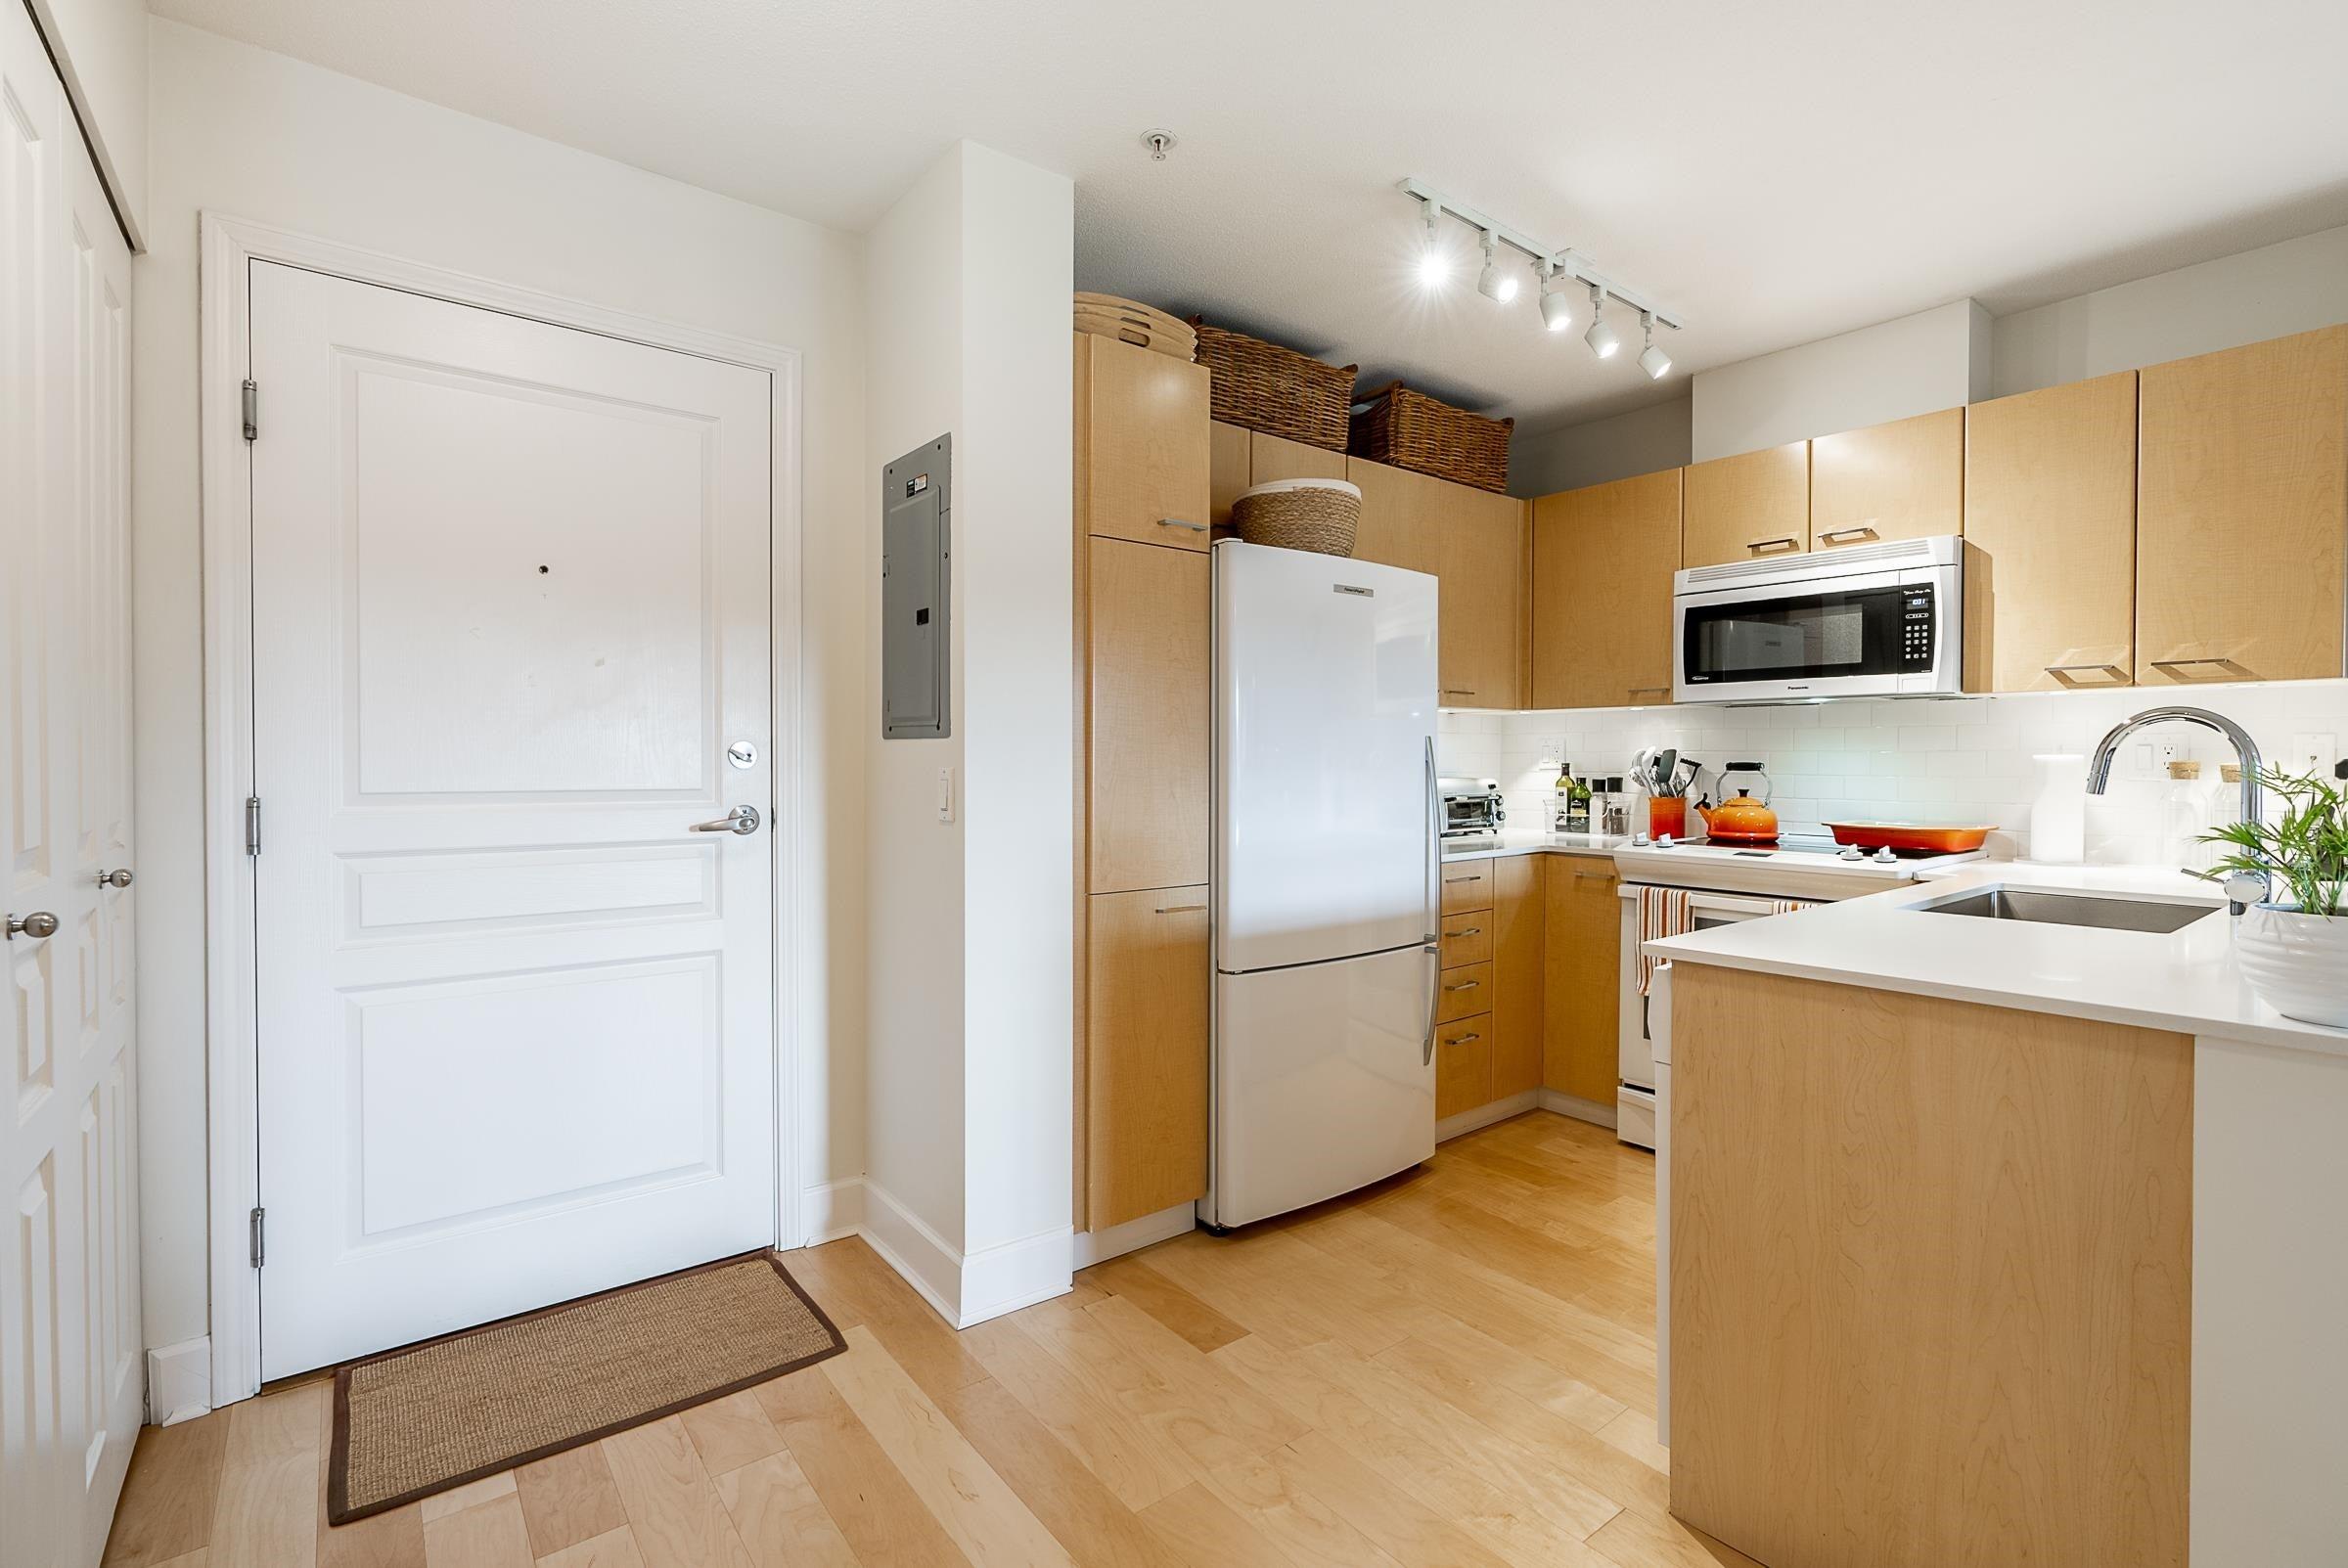 406 1989 DUNBAR STREET - Kitsilano Apartment/Condo for sale, 1 Bedroom (R2624949) - #13